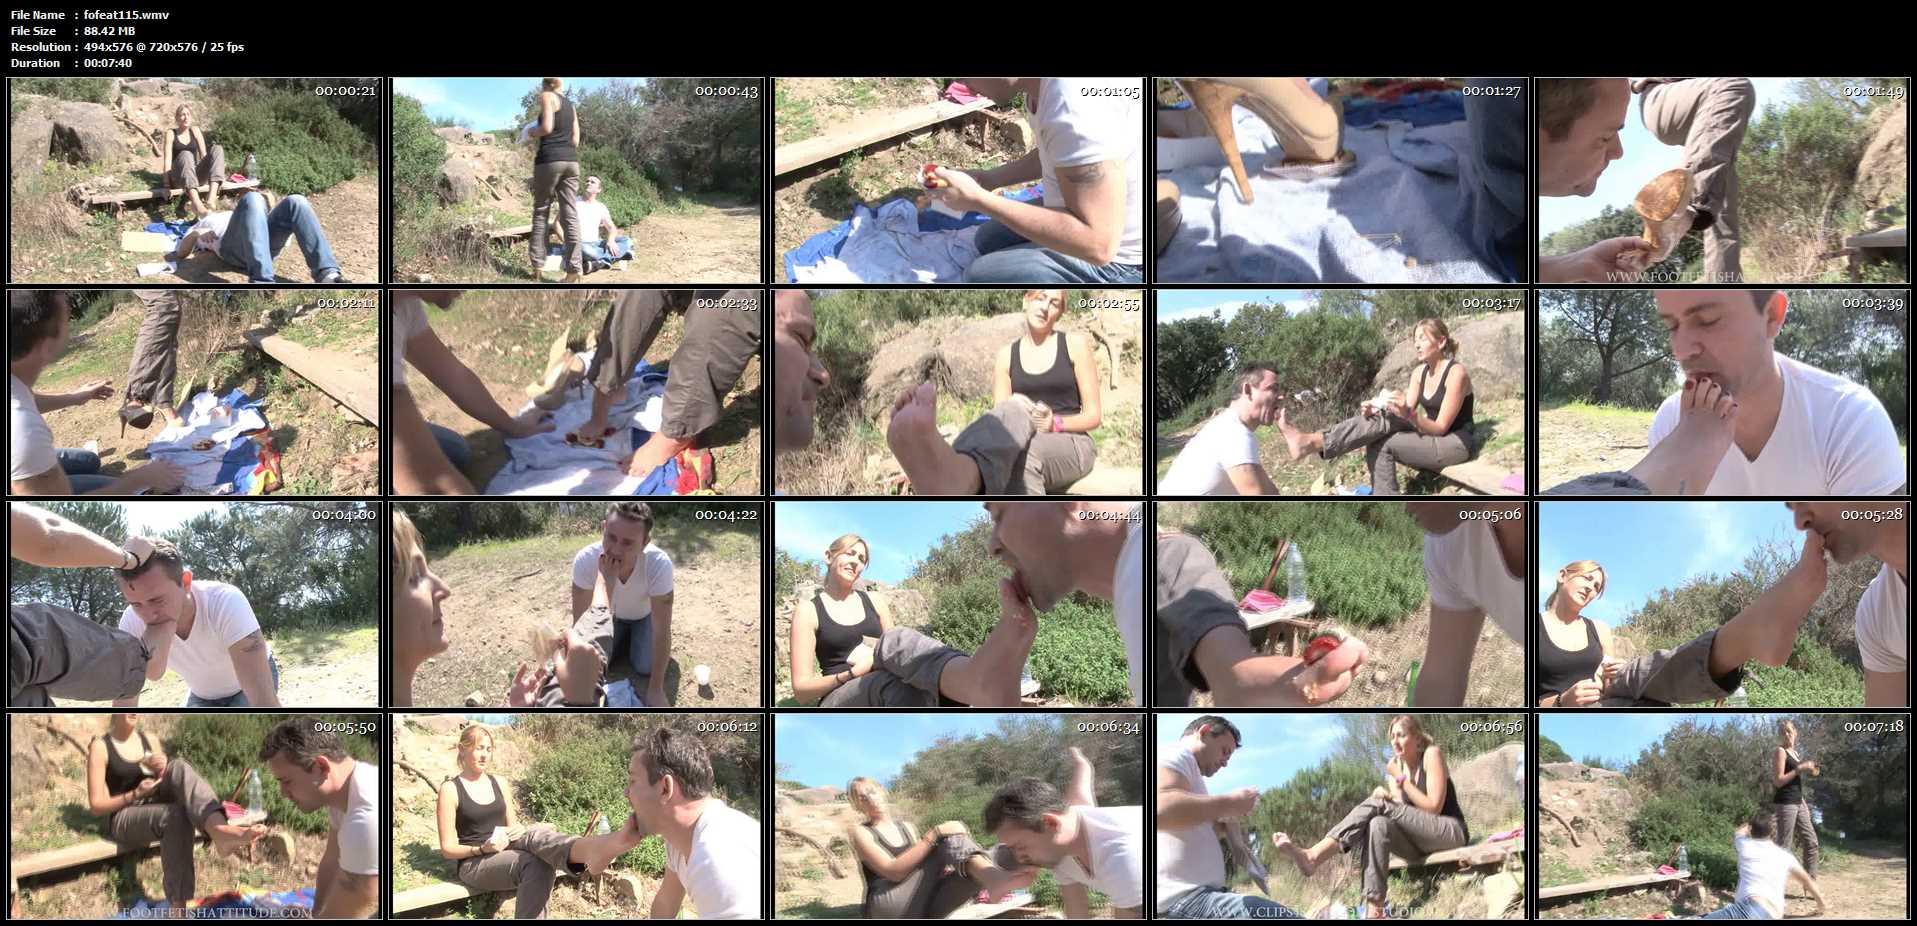 Mistress Kitty In Scene: The shoeshine boy - FOOTFETISHATTITUDE - SD/576p/WMV